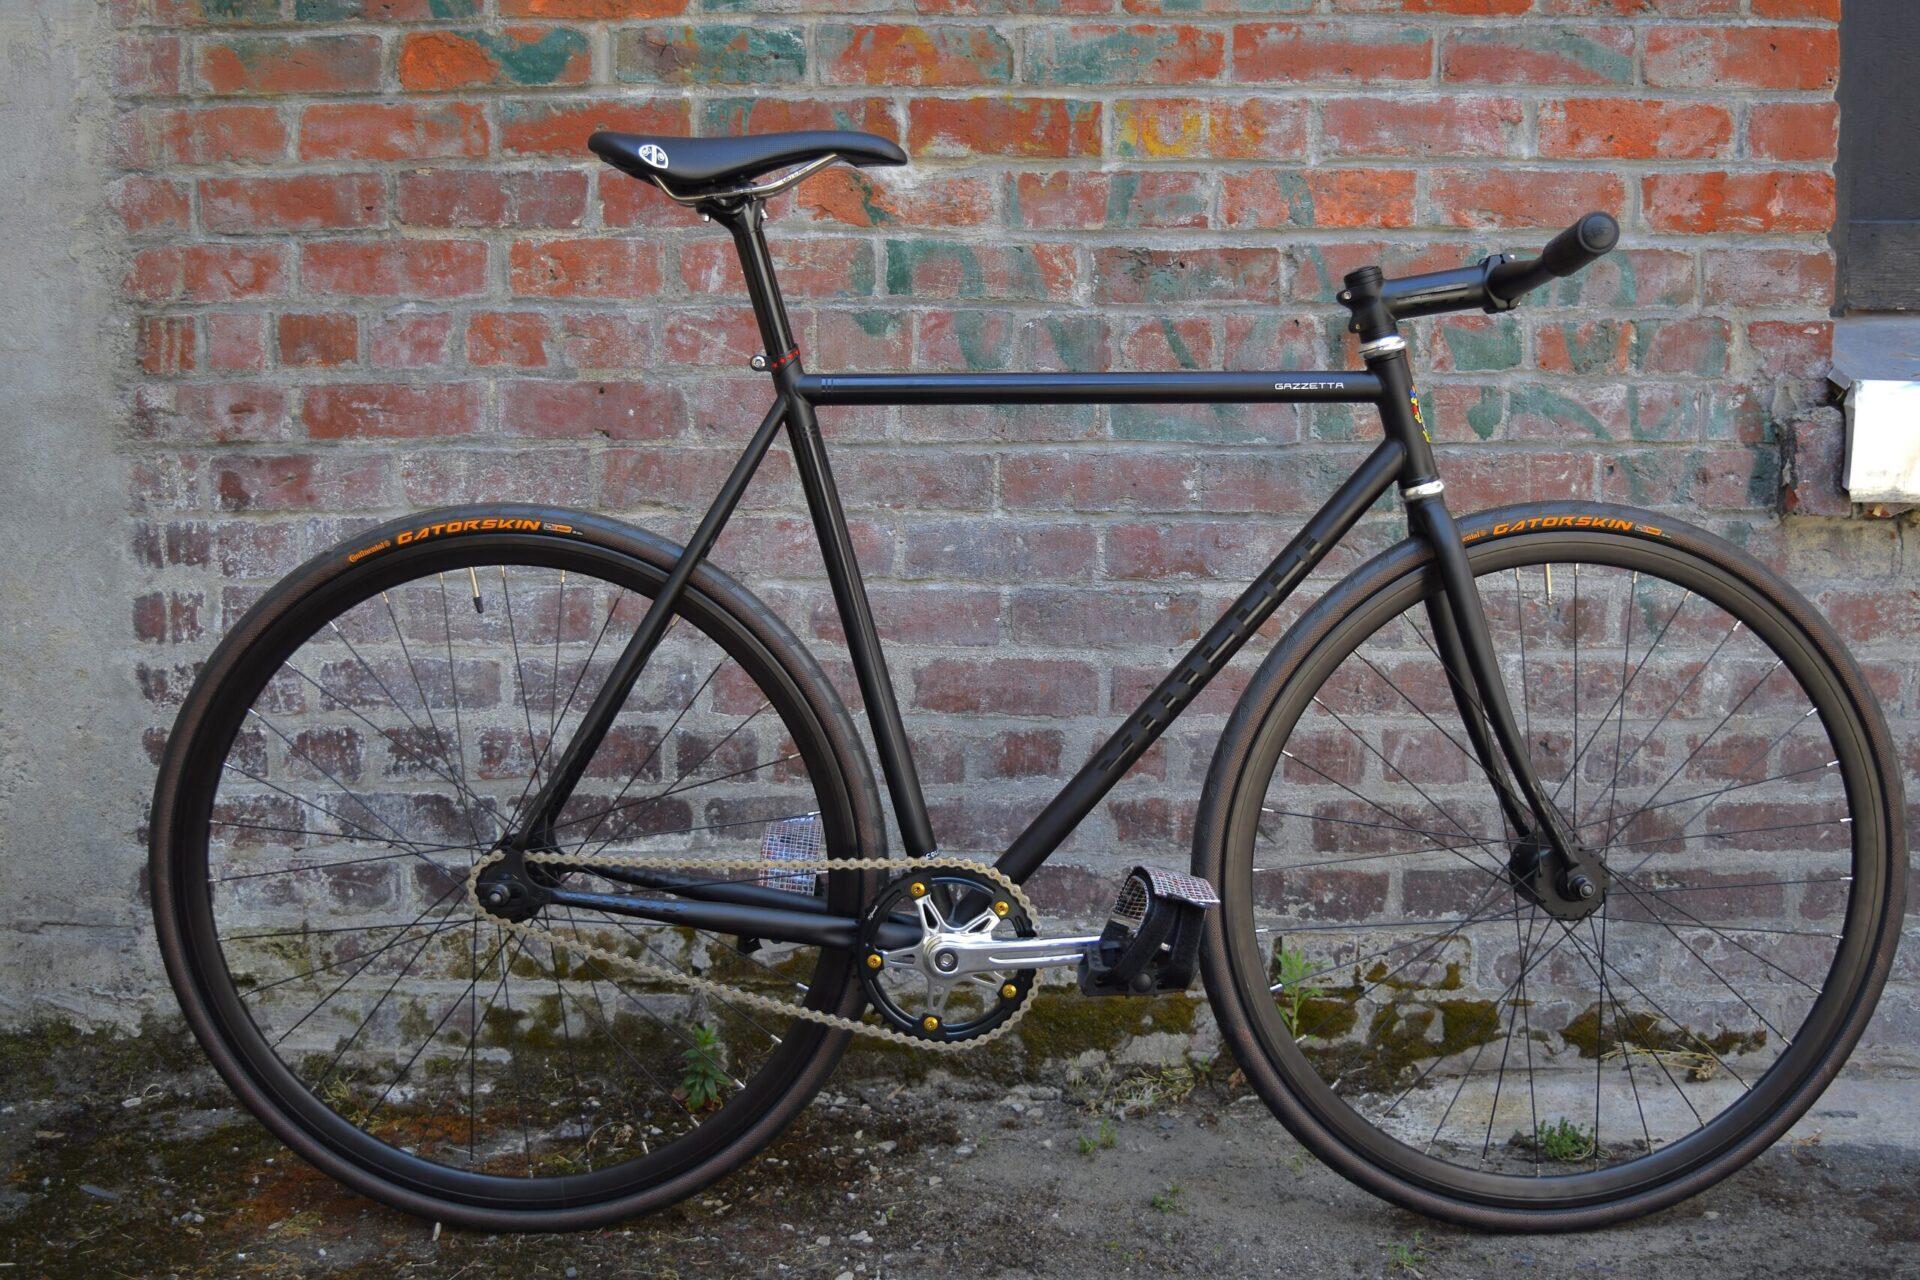 Bike Check: Cinelli Gazzetta – Broad Street Cycles